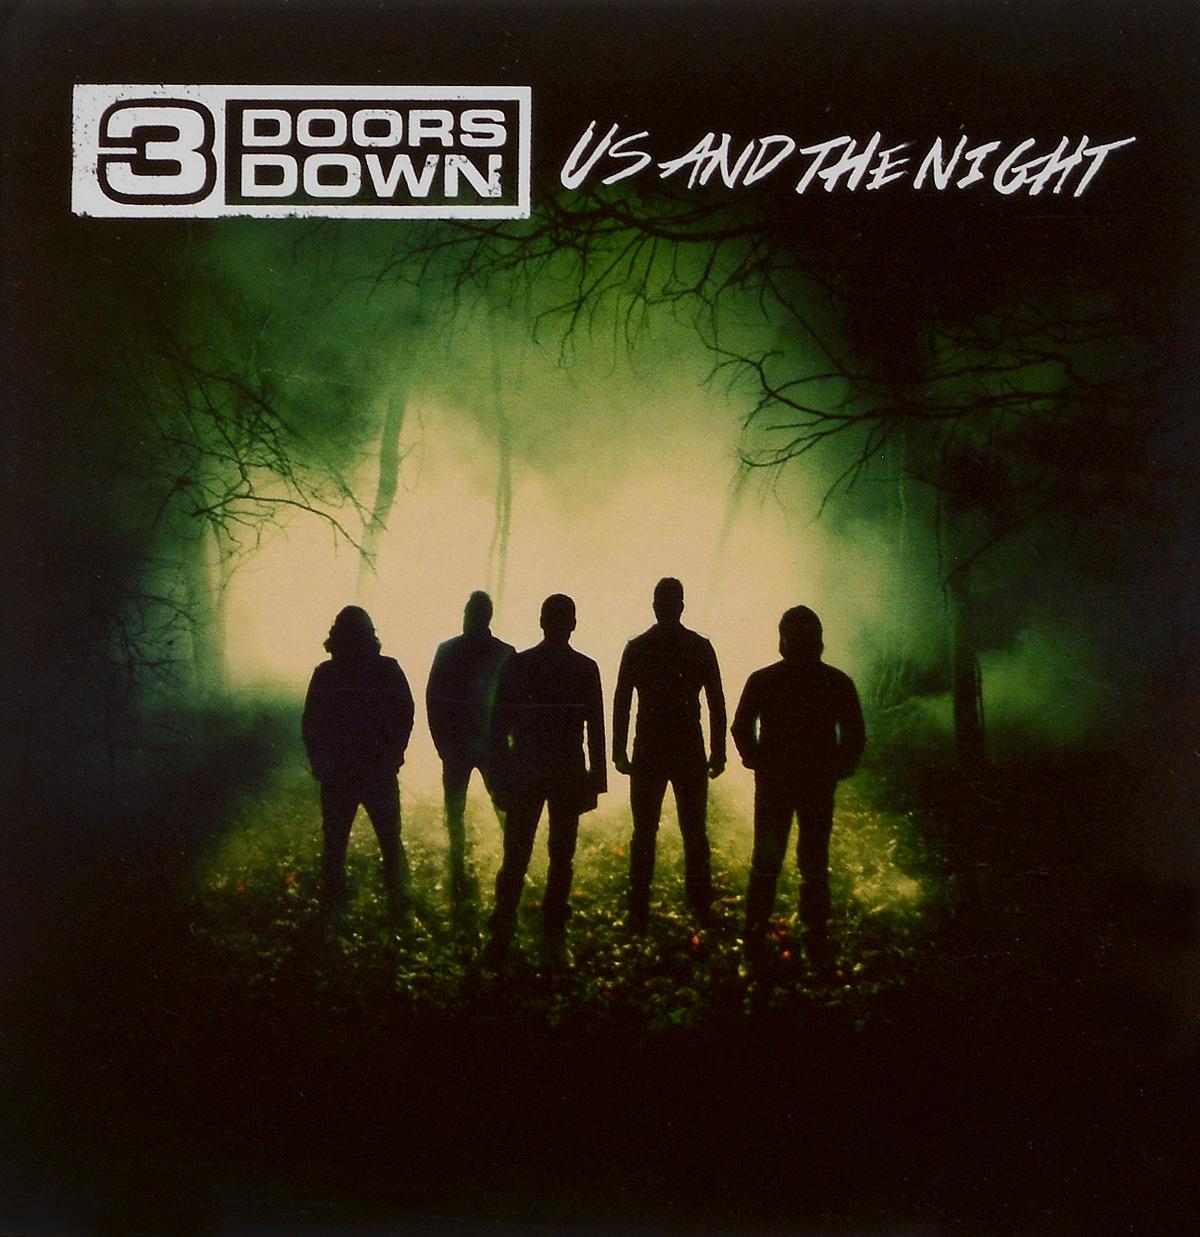 цена на 3 Doors Down 3 Doors Down. Us And The Night